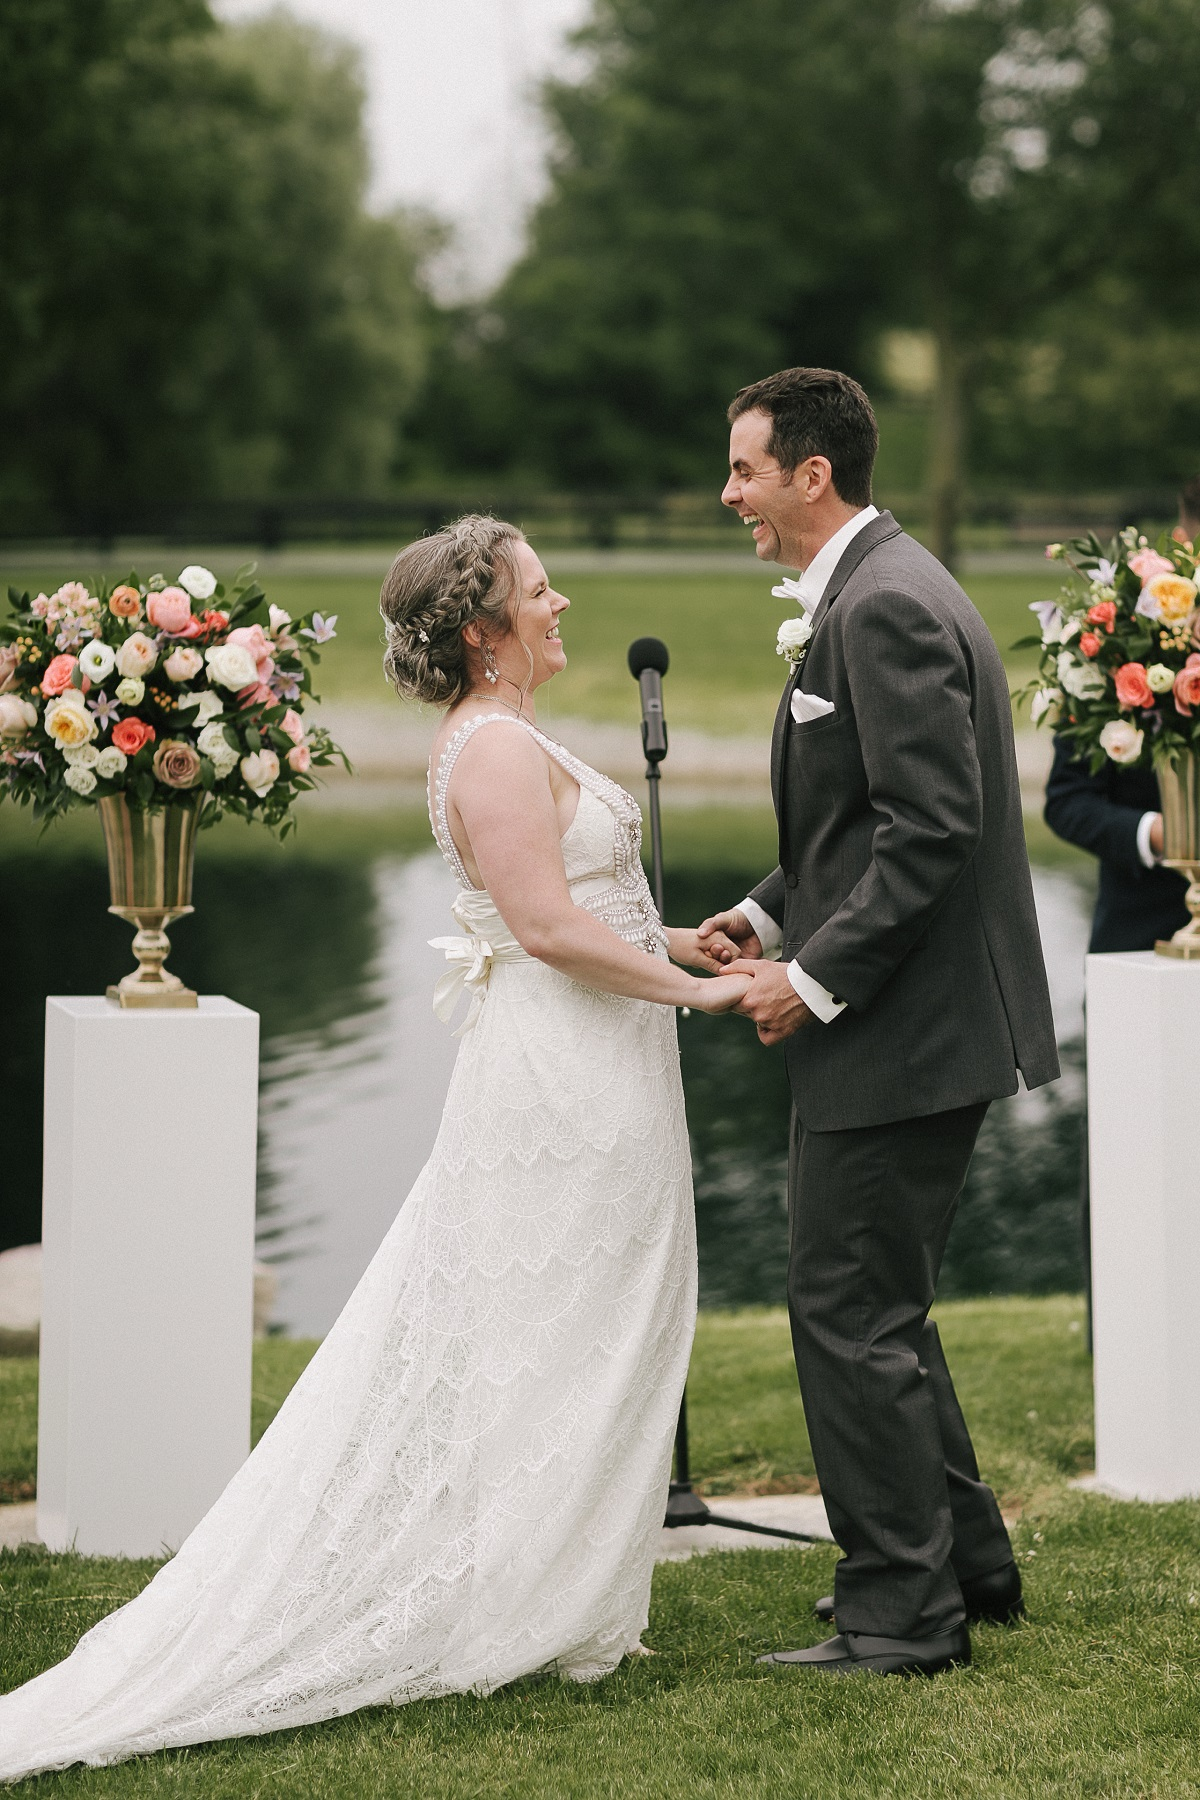 tented-wedding-planner-ancaster-kj-and-co 20.JPG